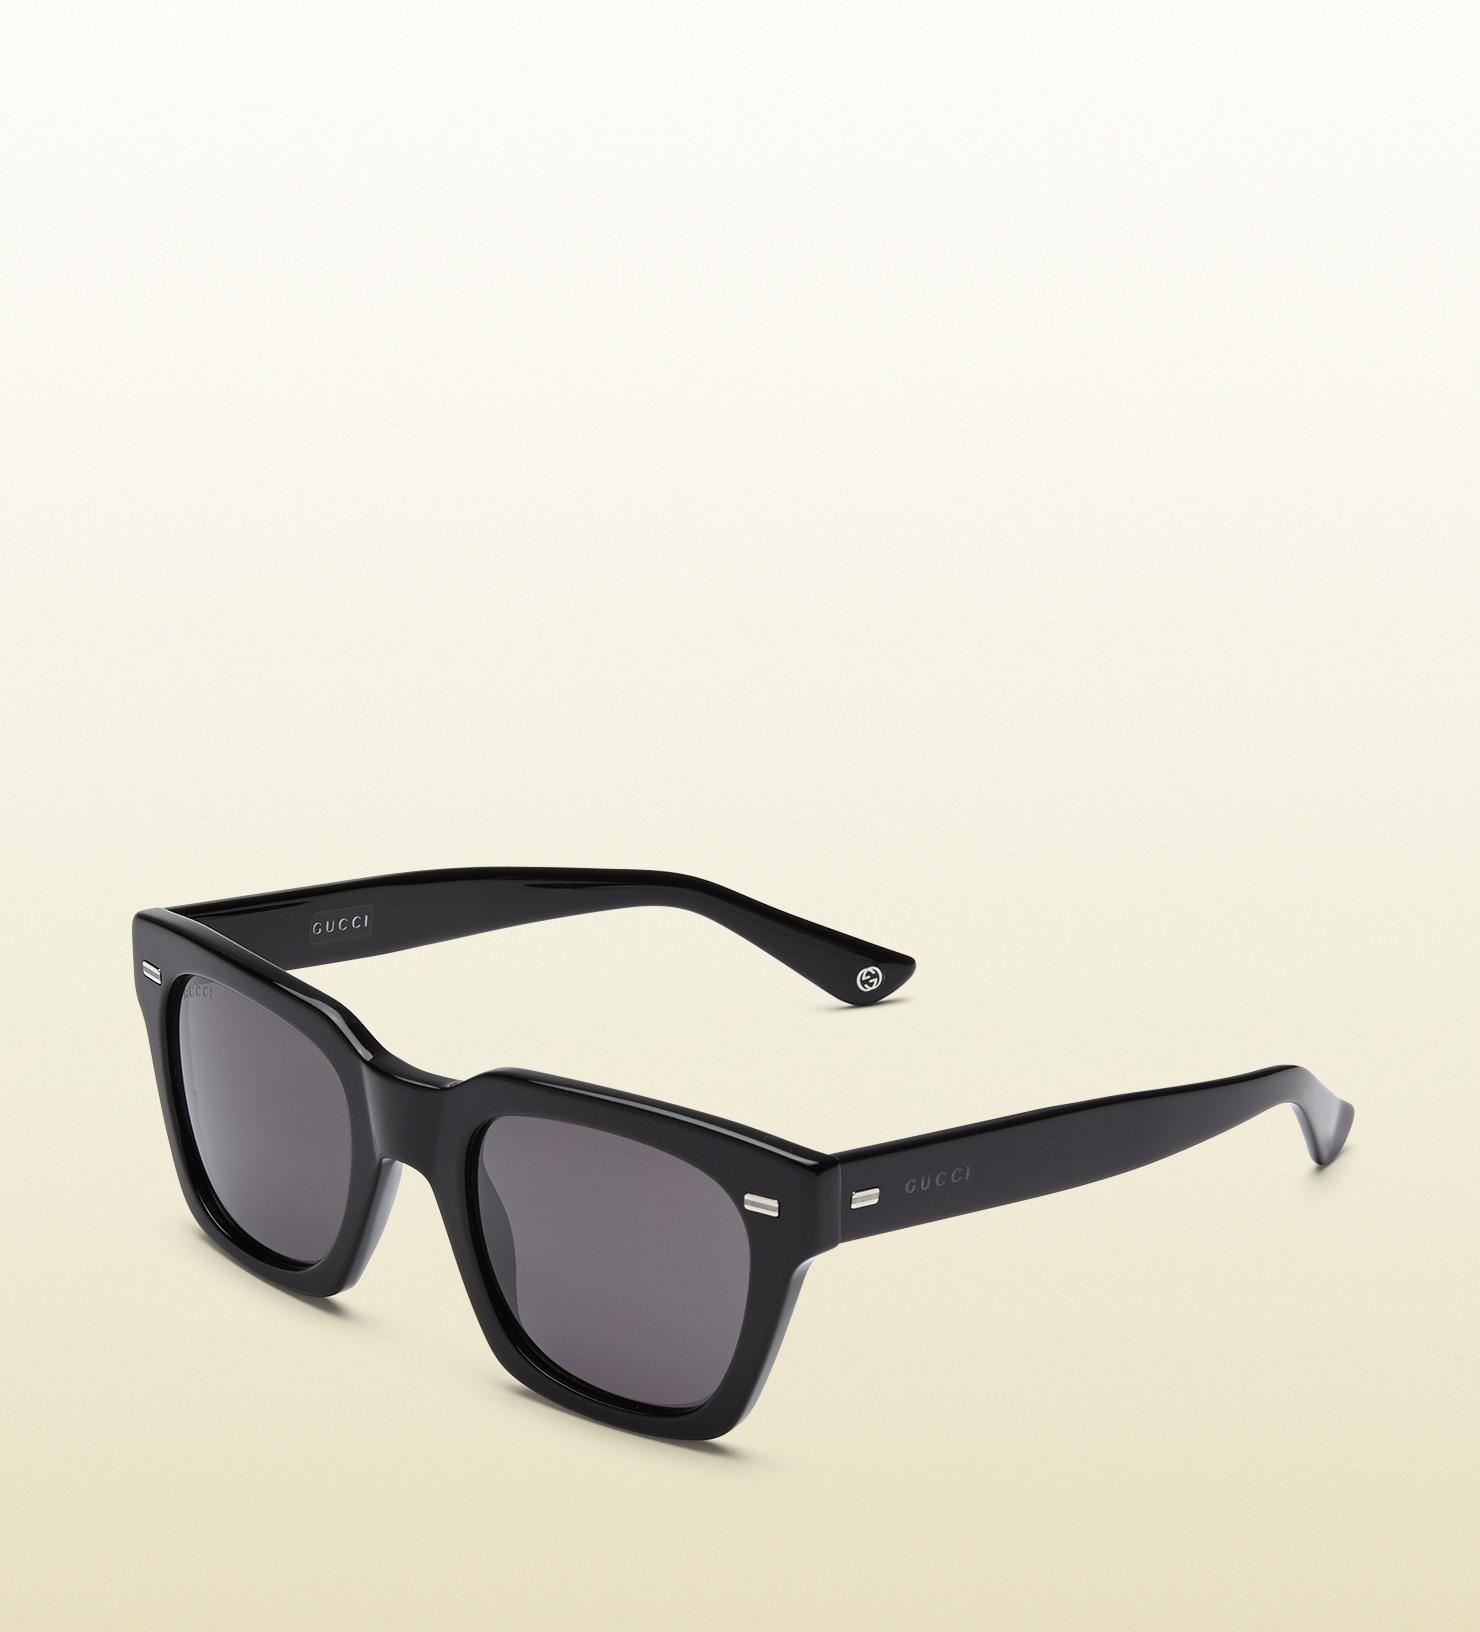 Lyst - Gucci Havana Acetate Square-frame Sunglasses in Black for Men